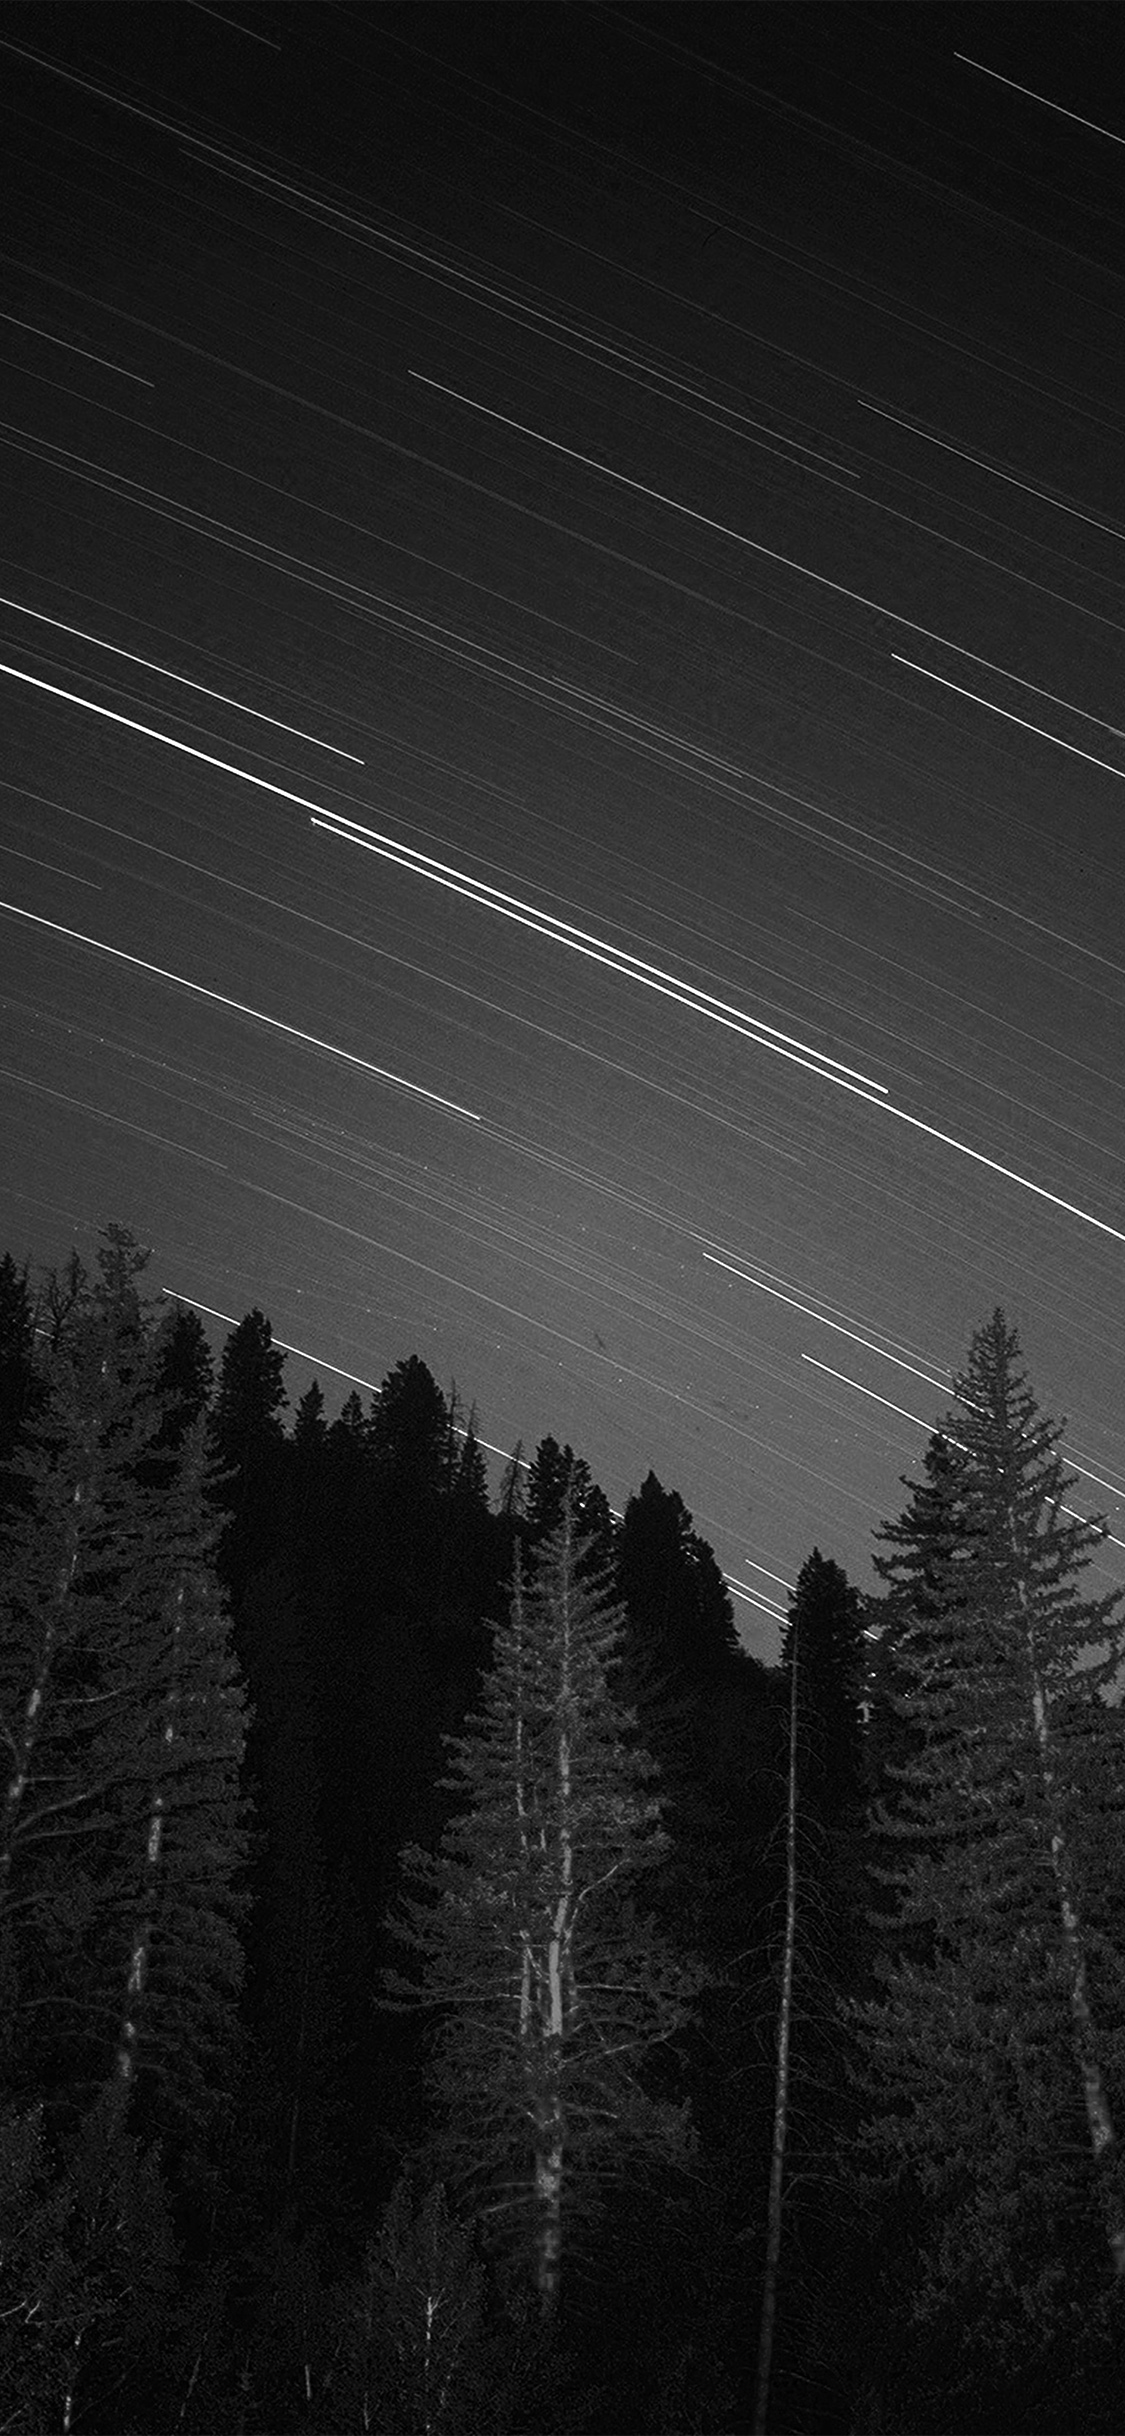 iPhonexpapers.com-Apple-iPhone-wallpaper-ng82-night-wood-mountain-star-sky-nature-bw-dark